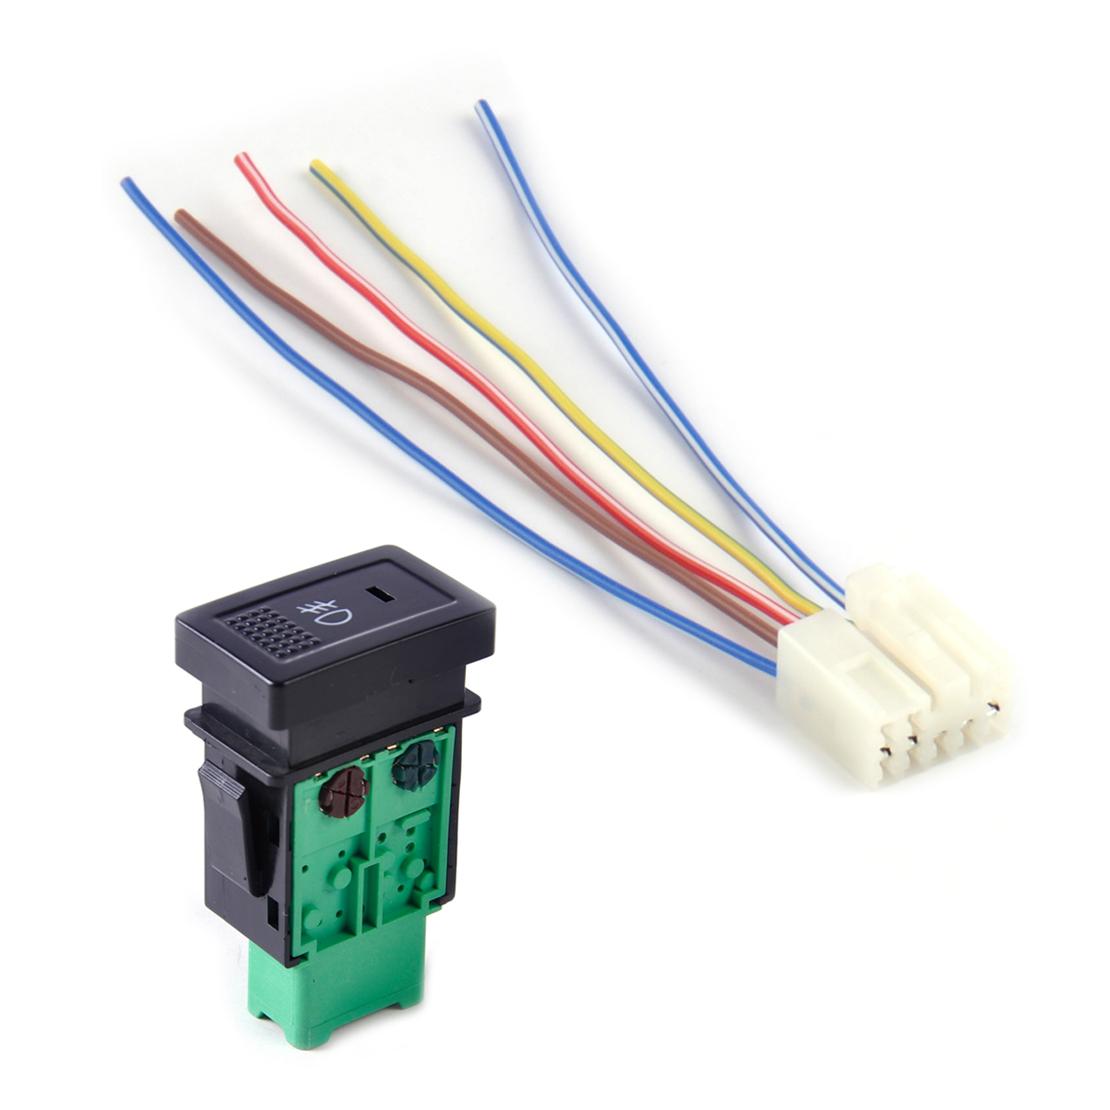 hight resolution of details about fog light switch plug harness for suzuki sx4 swift lingyang alto grand vitara